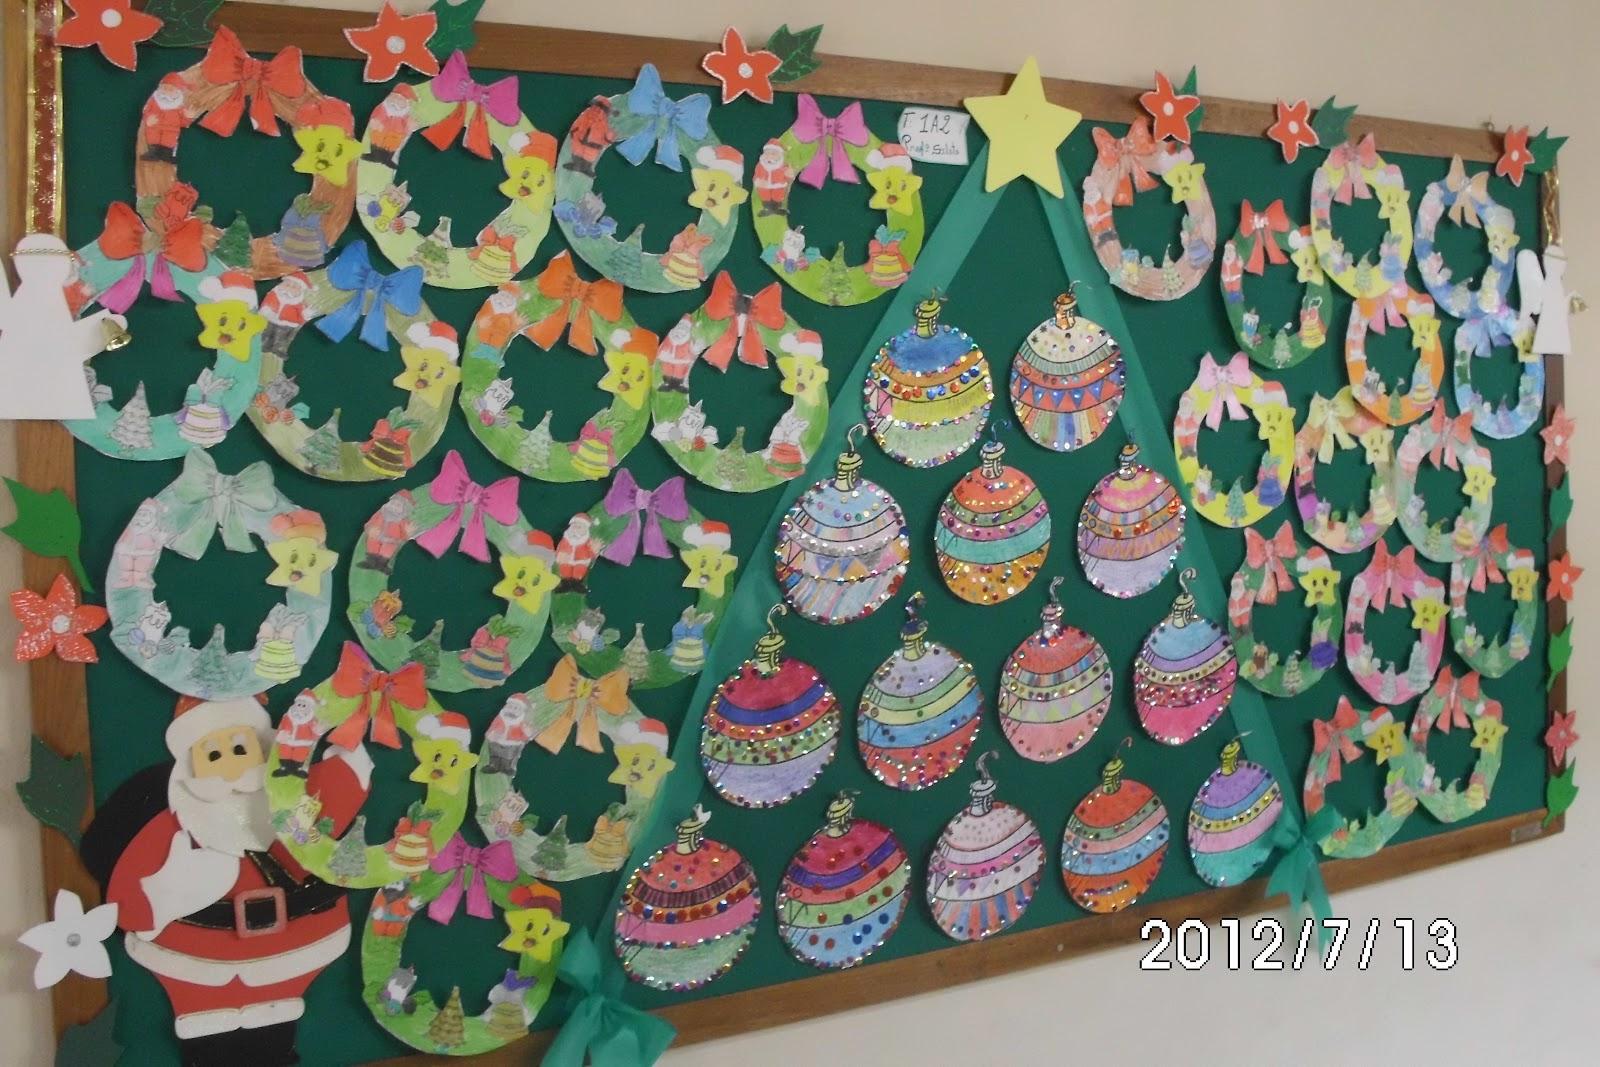 Pibid escola gusm o britto mural e trabalhos de natal for Mural de natal 4 ano